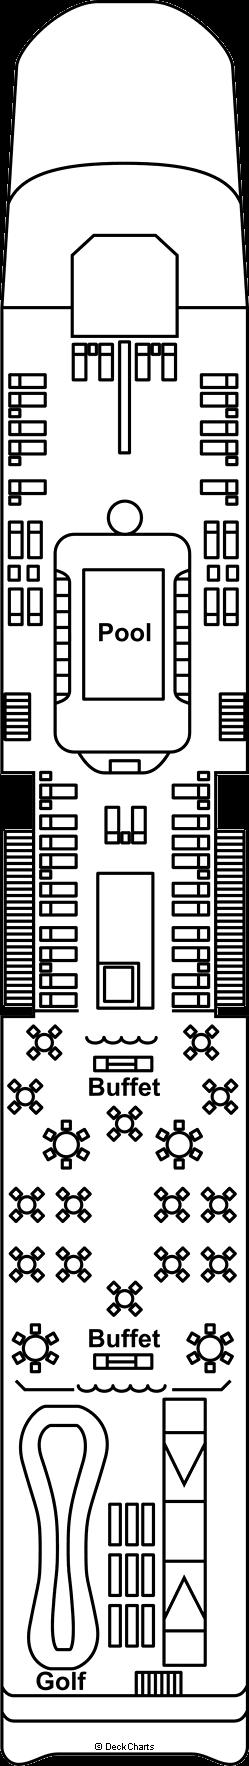 Viking Osfrid: Sun Deck